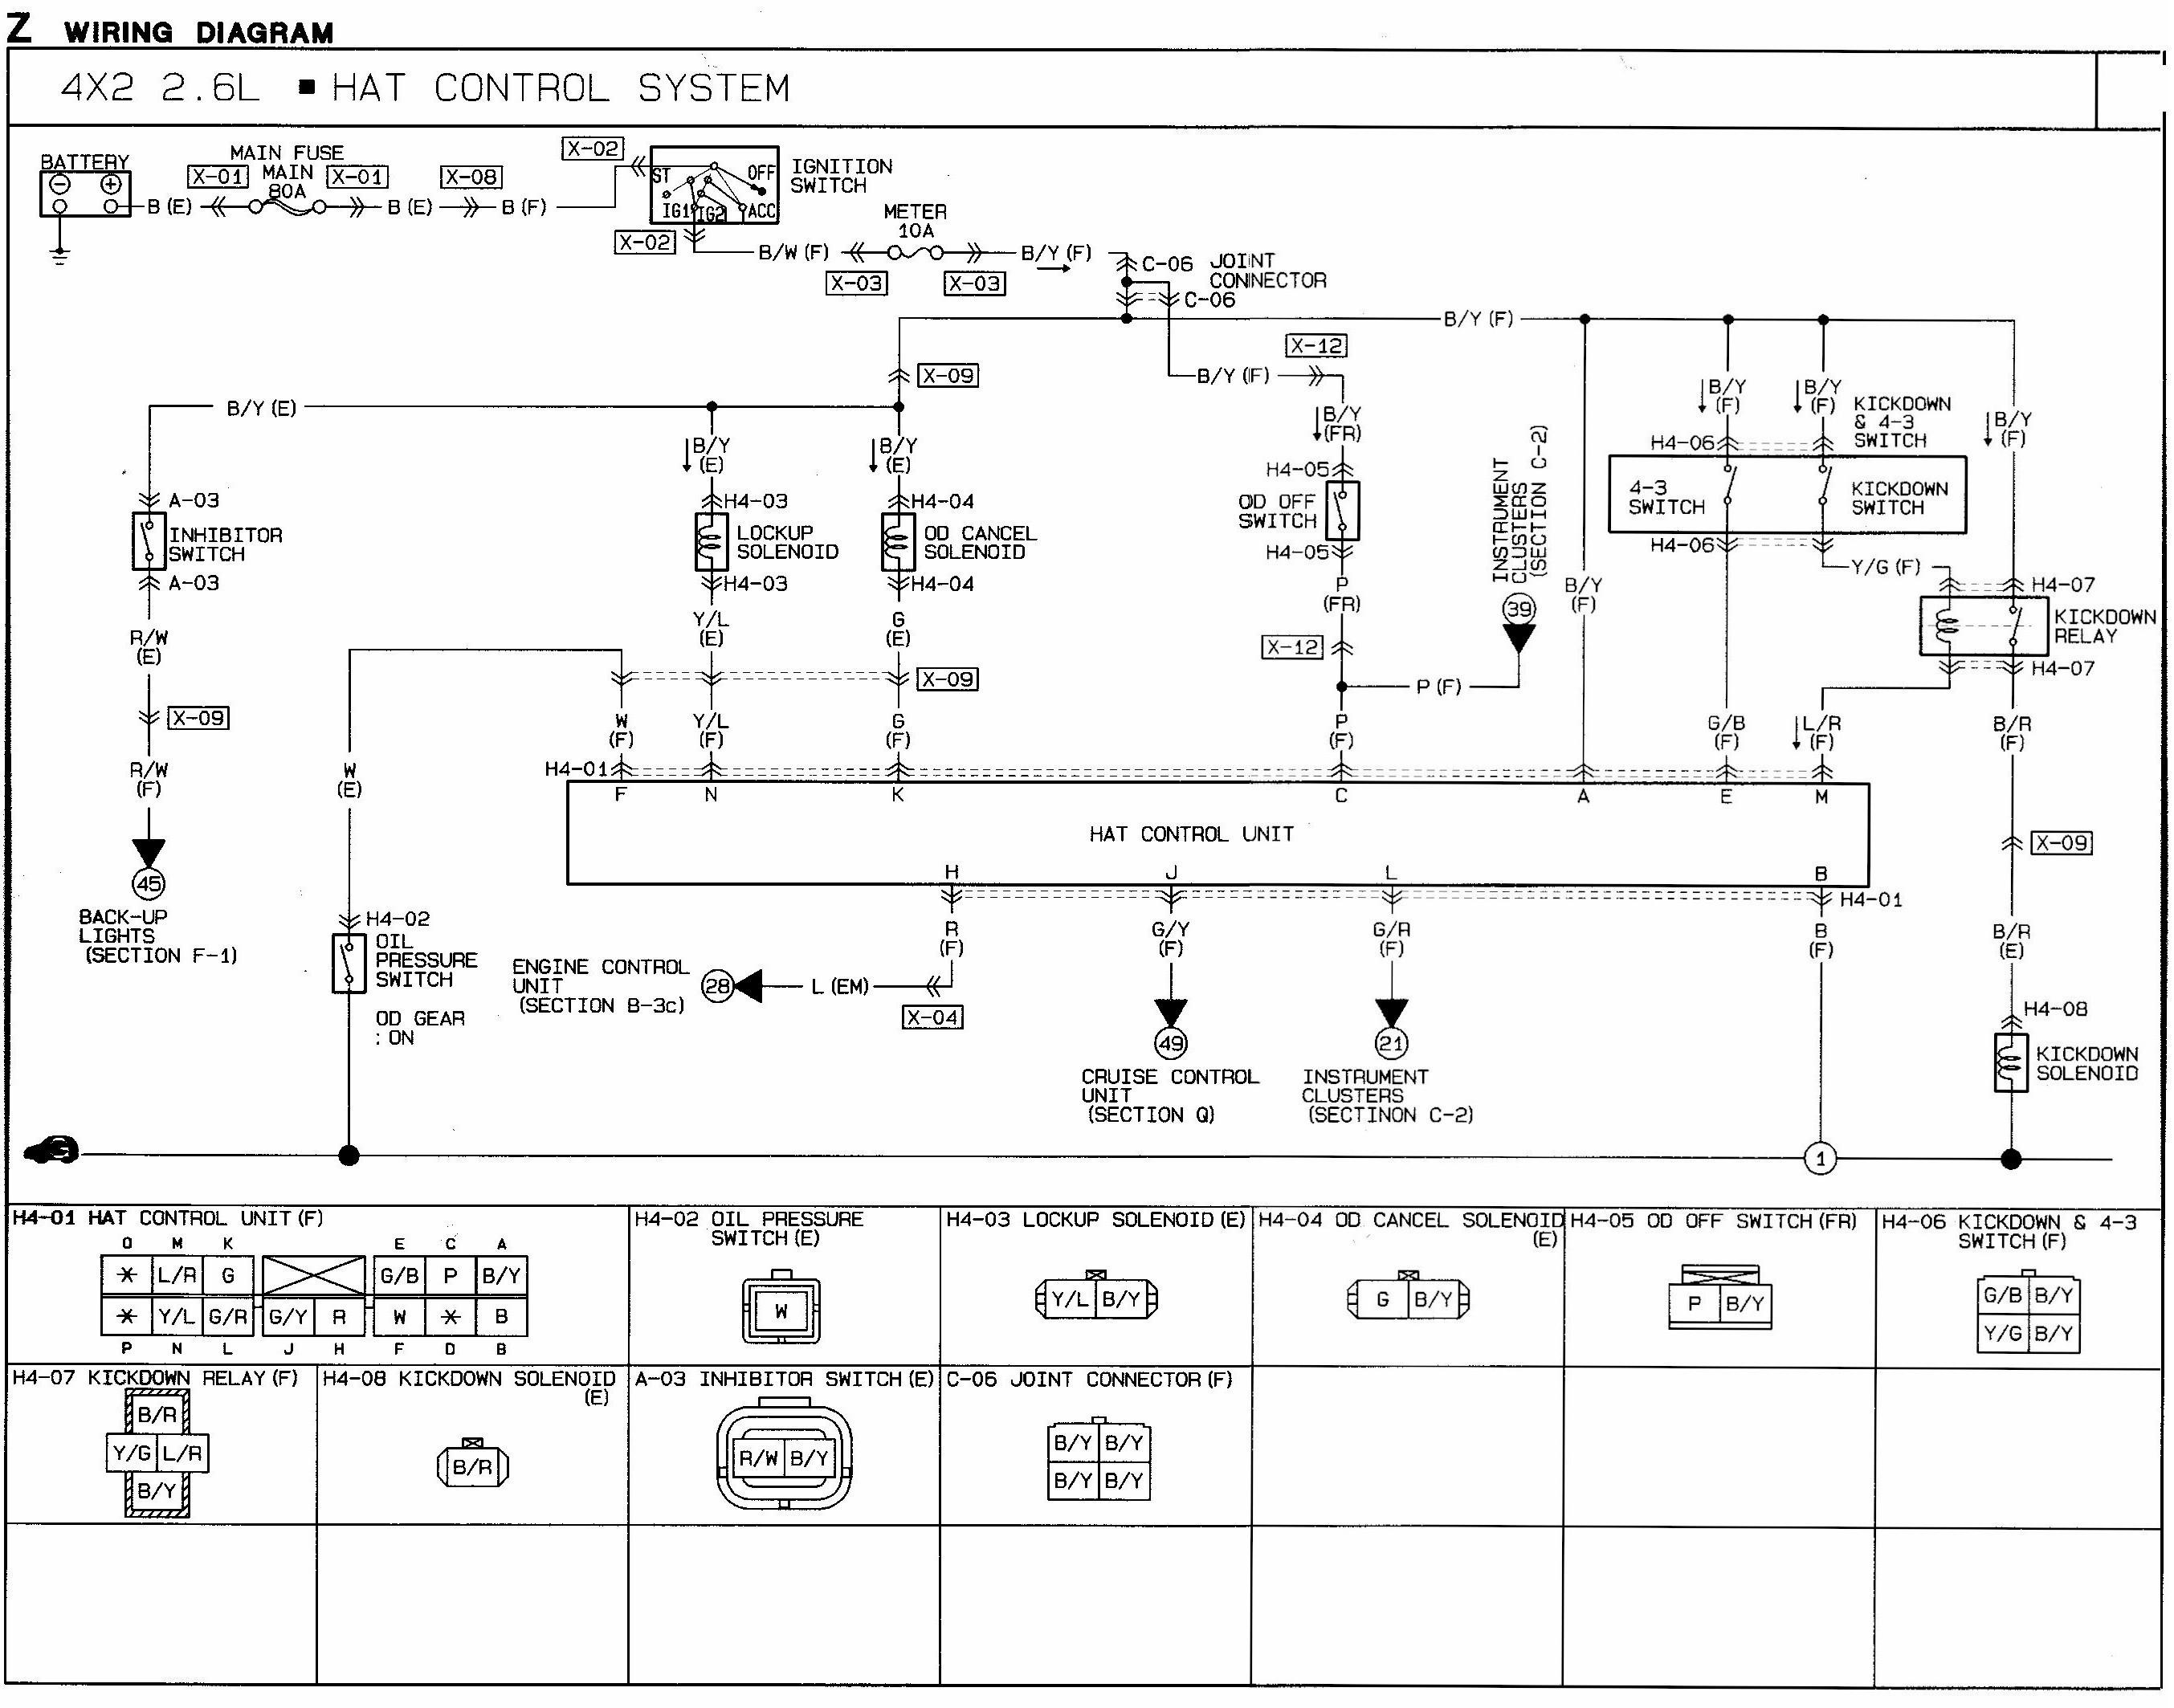 2000 Jeep Cherokee Sport Engine Diagram 1995 Jeep Grand ... Ac Wiring Diagram Jeep Cherokee Sport on